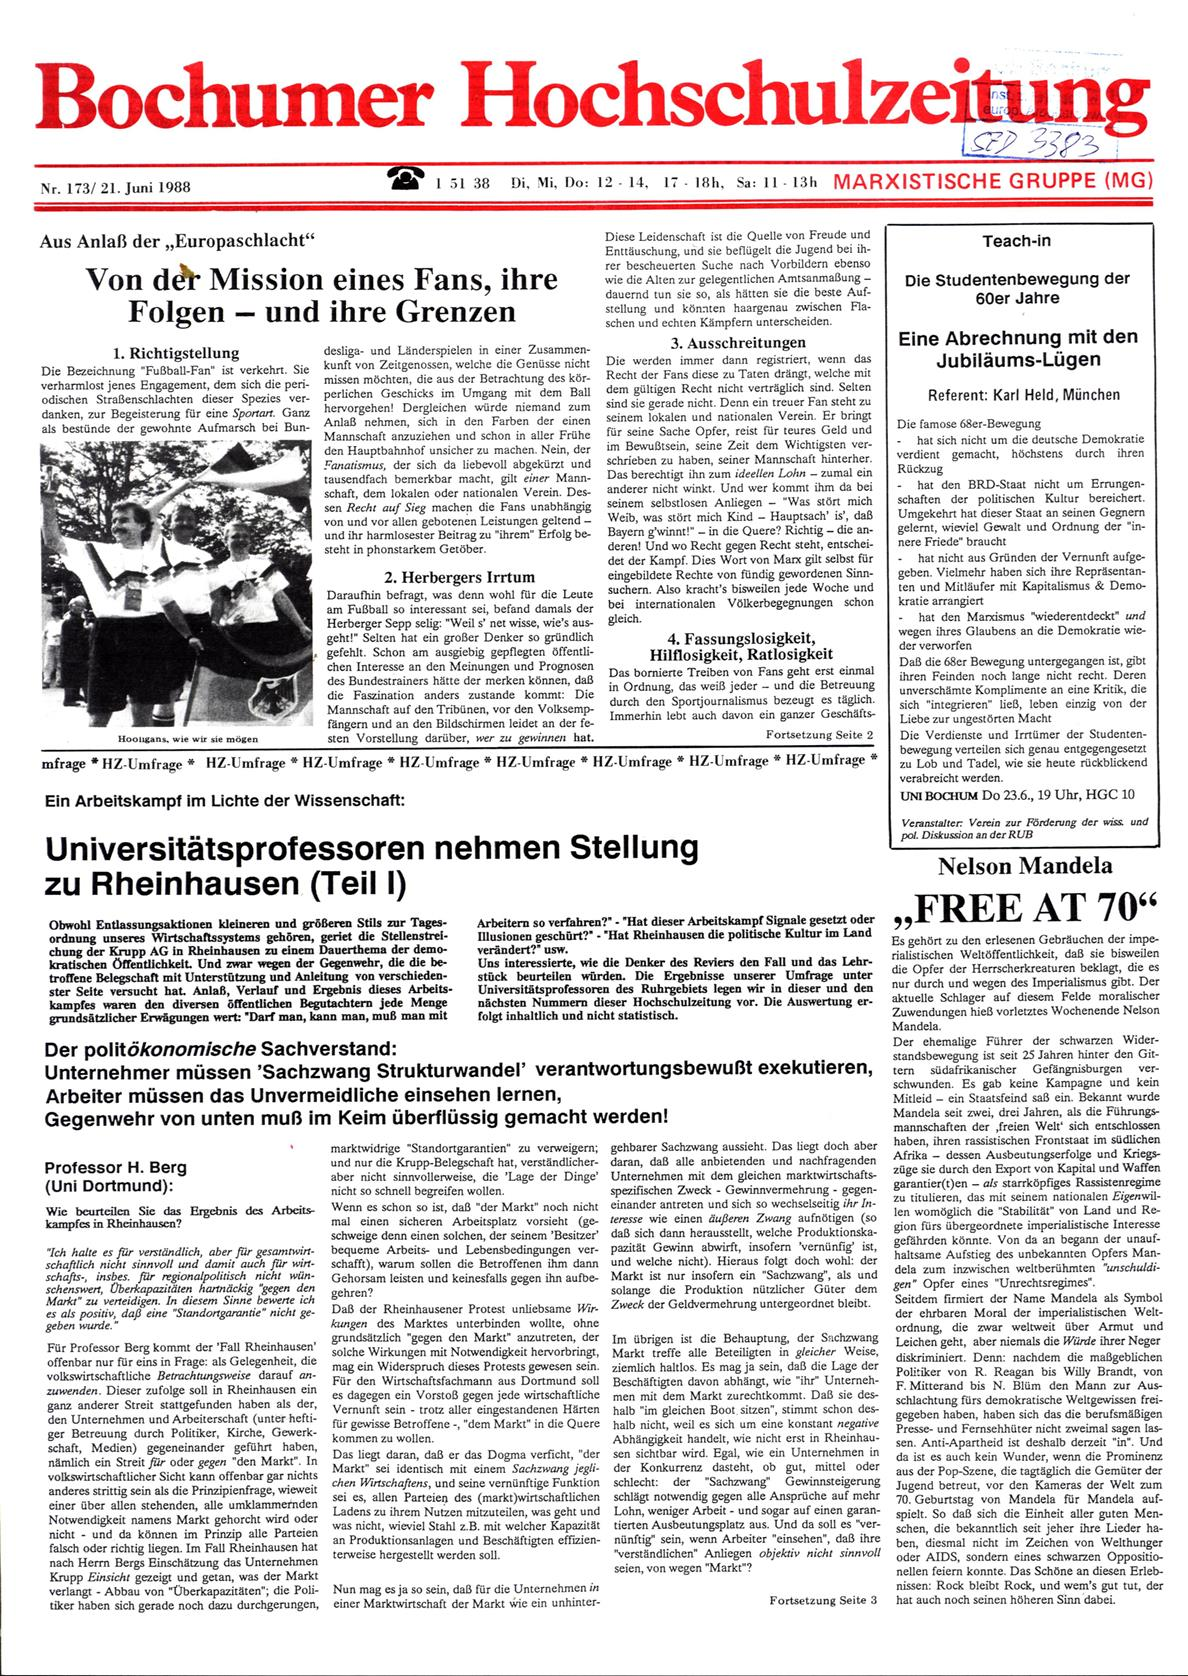 Bochum_BHZ_19880621_173_001